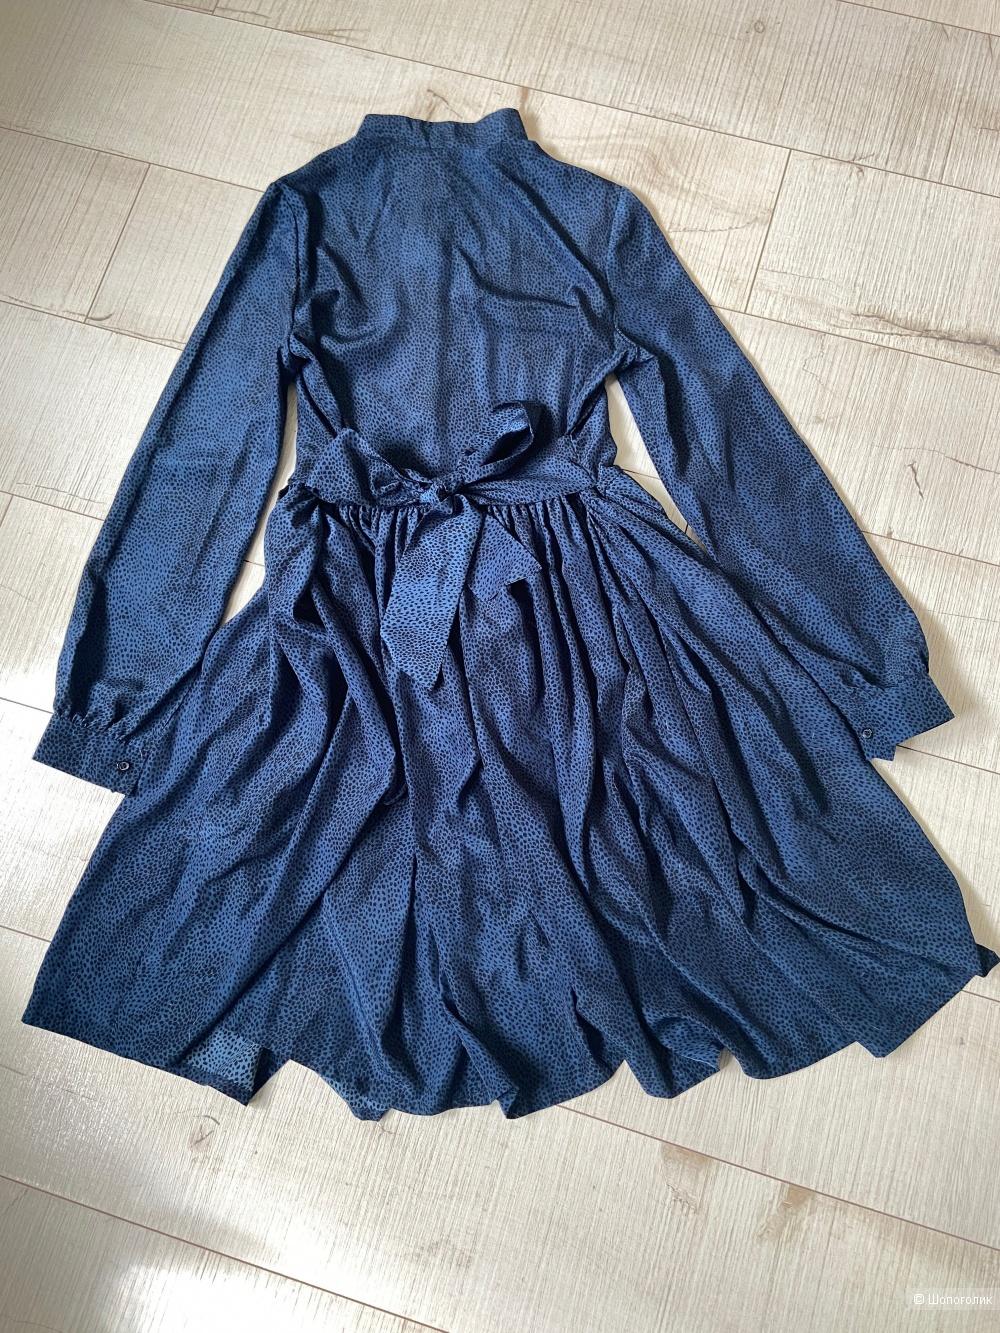 Платье Соня Мармеладова, размер 42-44